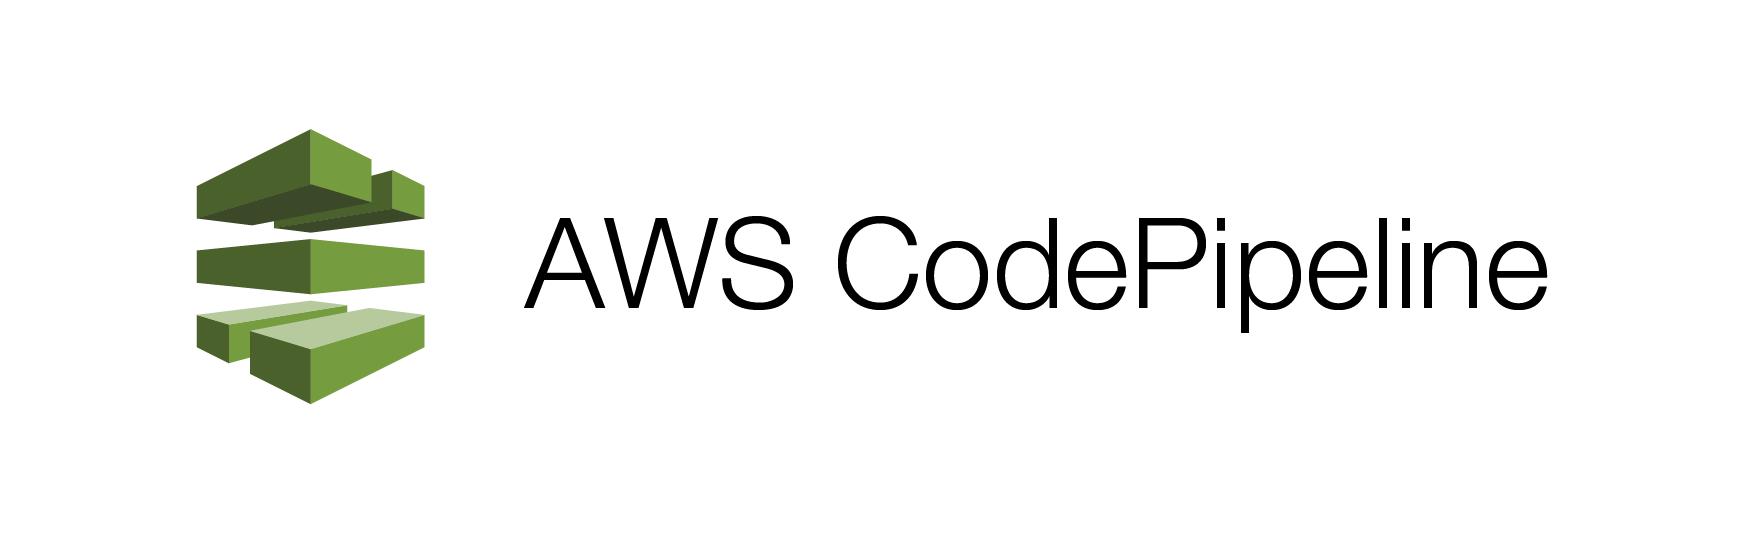 AWS CodeDeploy BlockTraffic 시간 단축